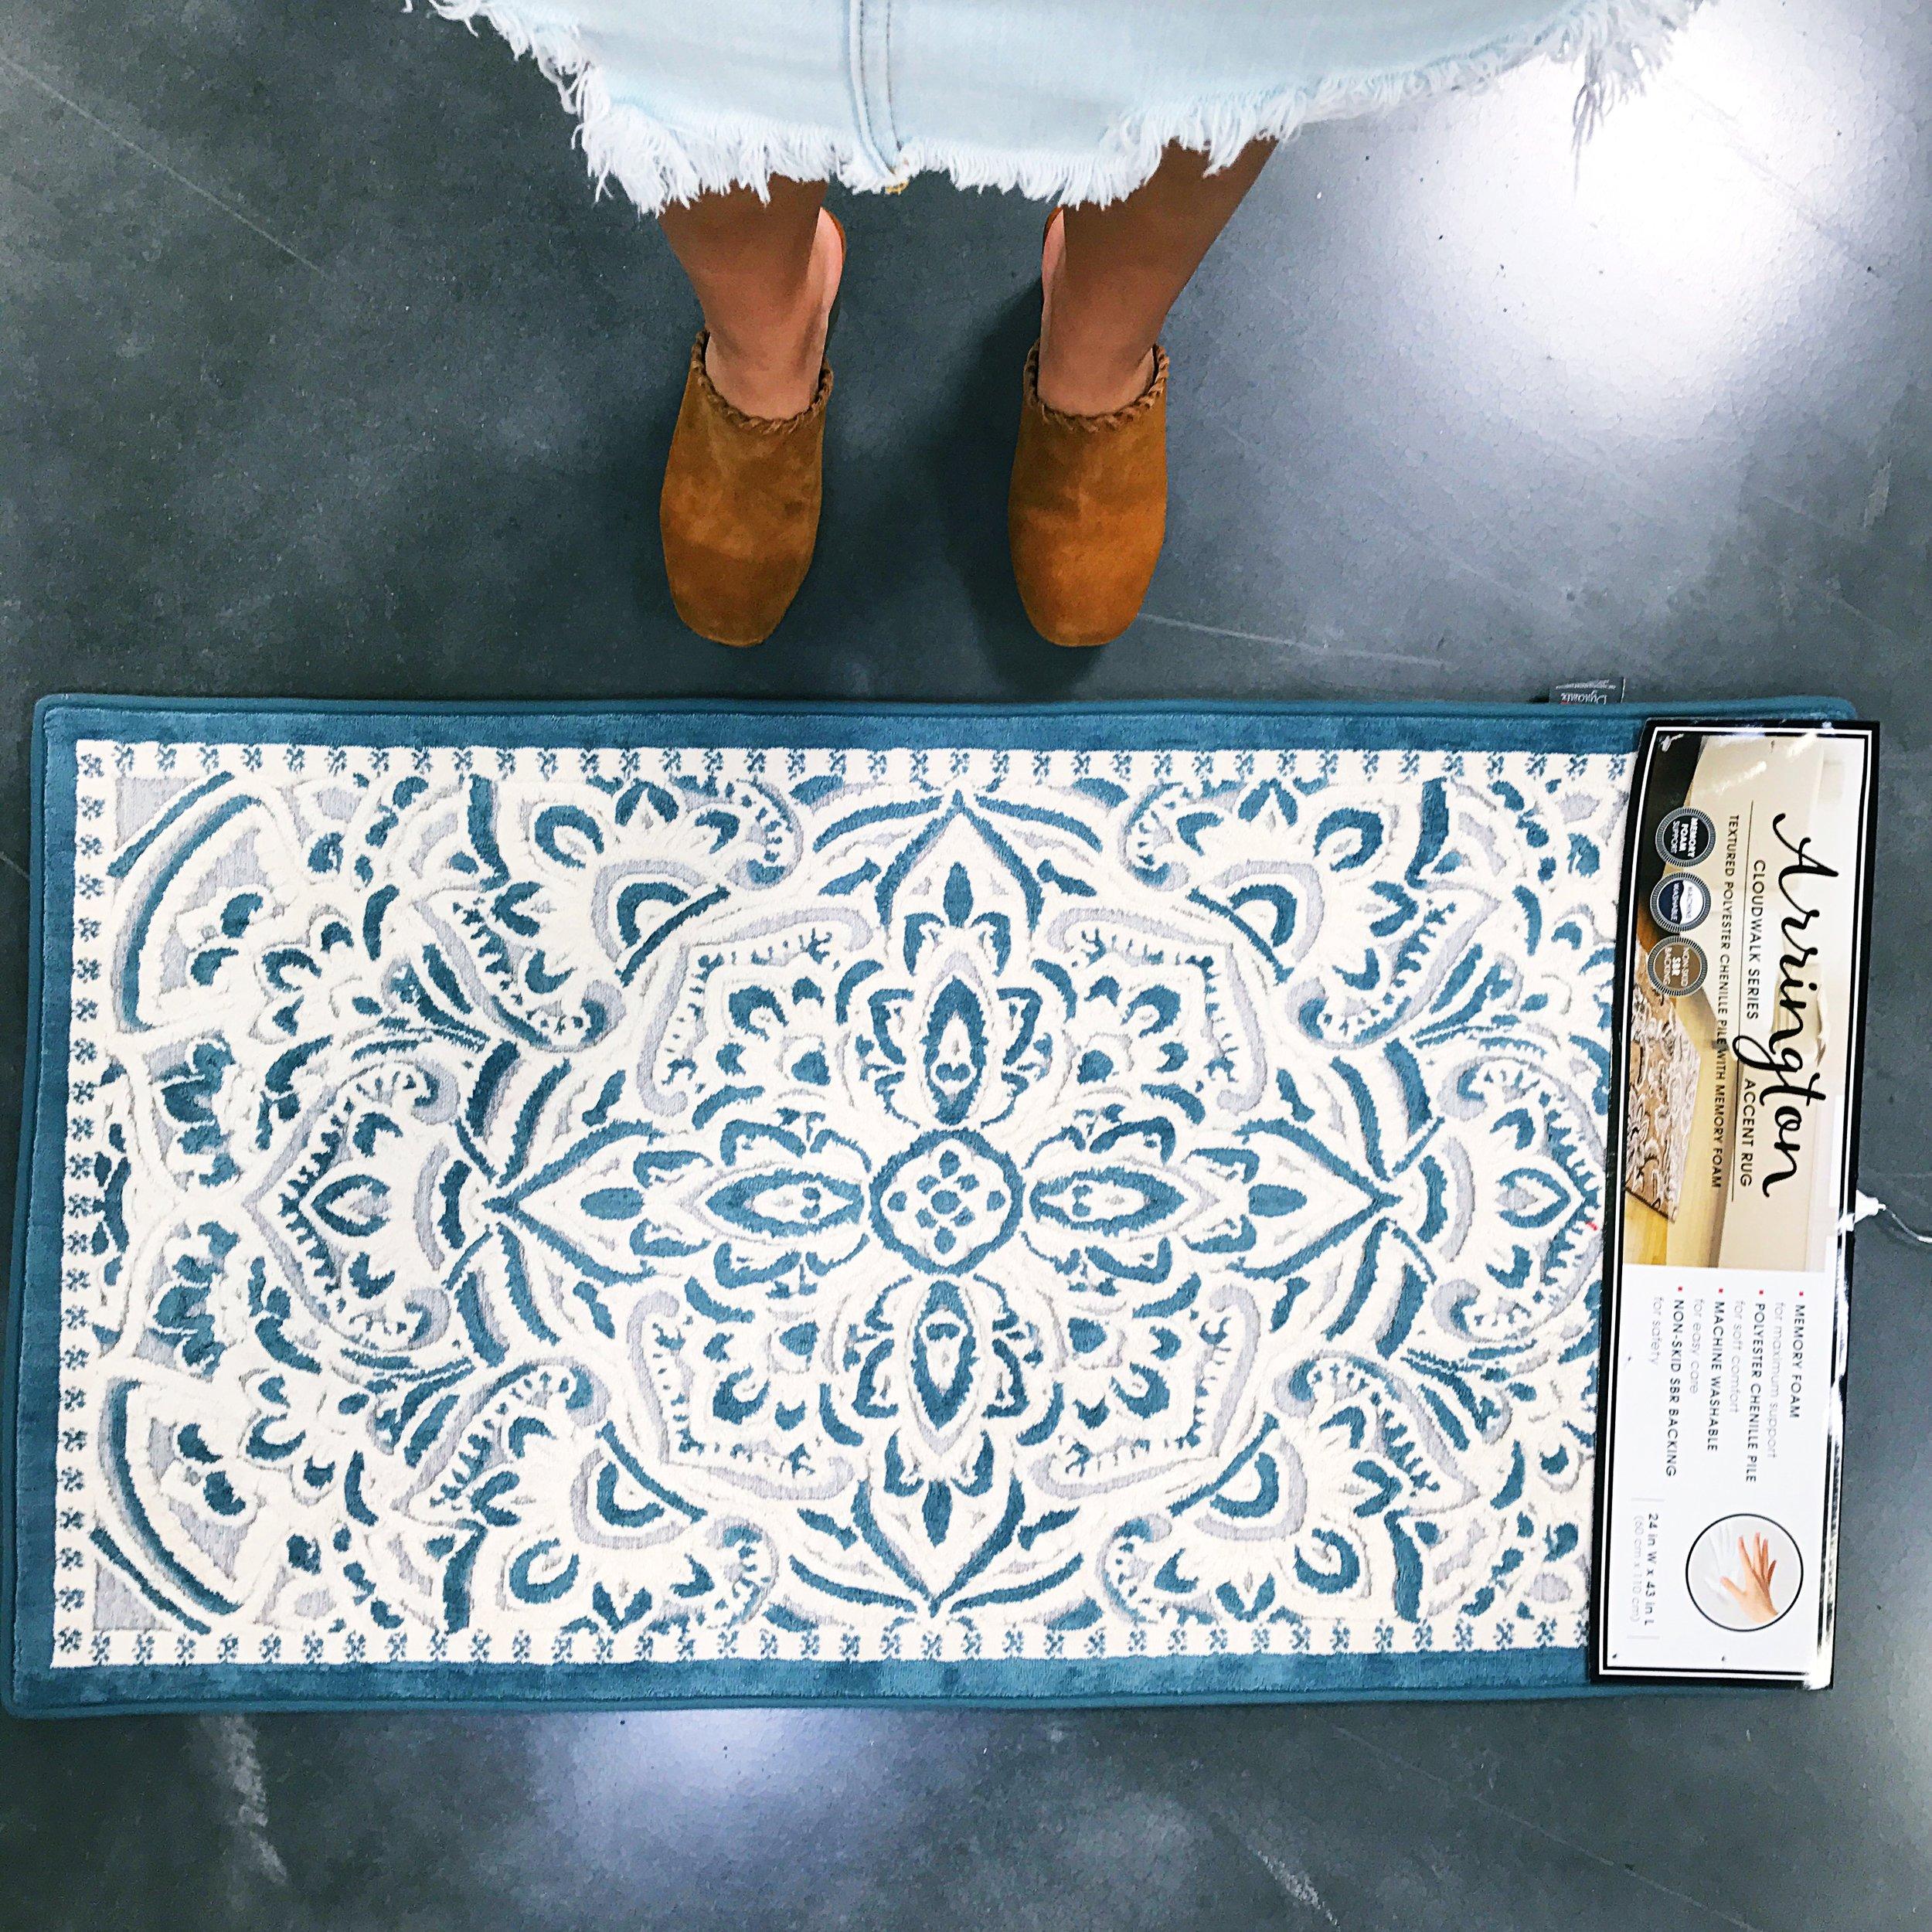 new lastest rug fresh that contour of foam rugs dry images bath memory fast buyaustinhome